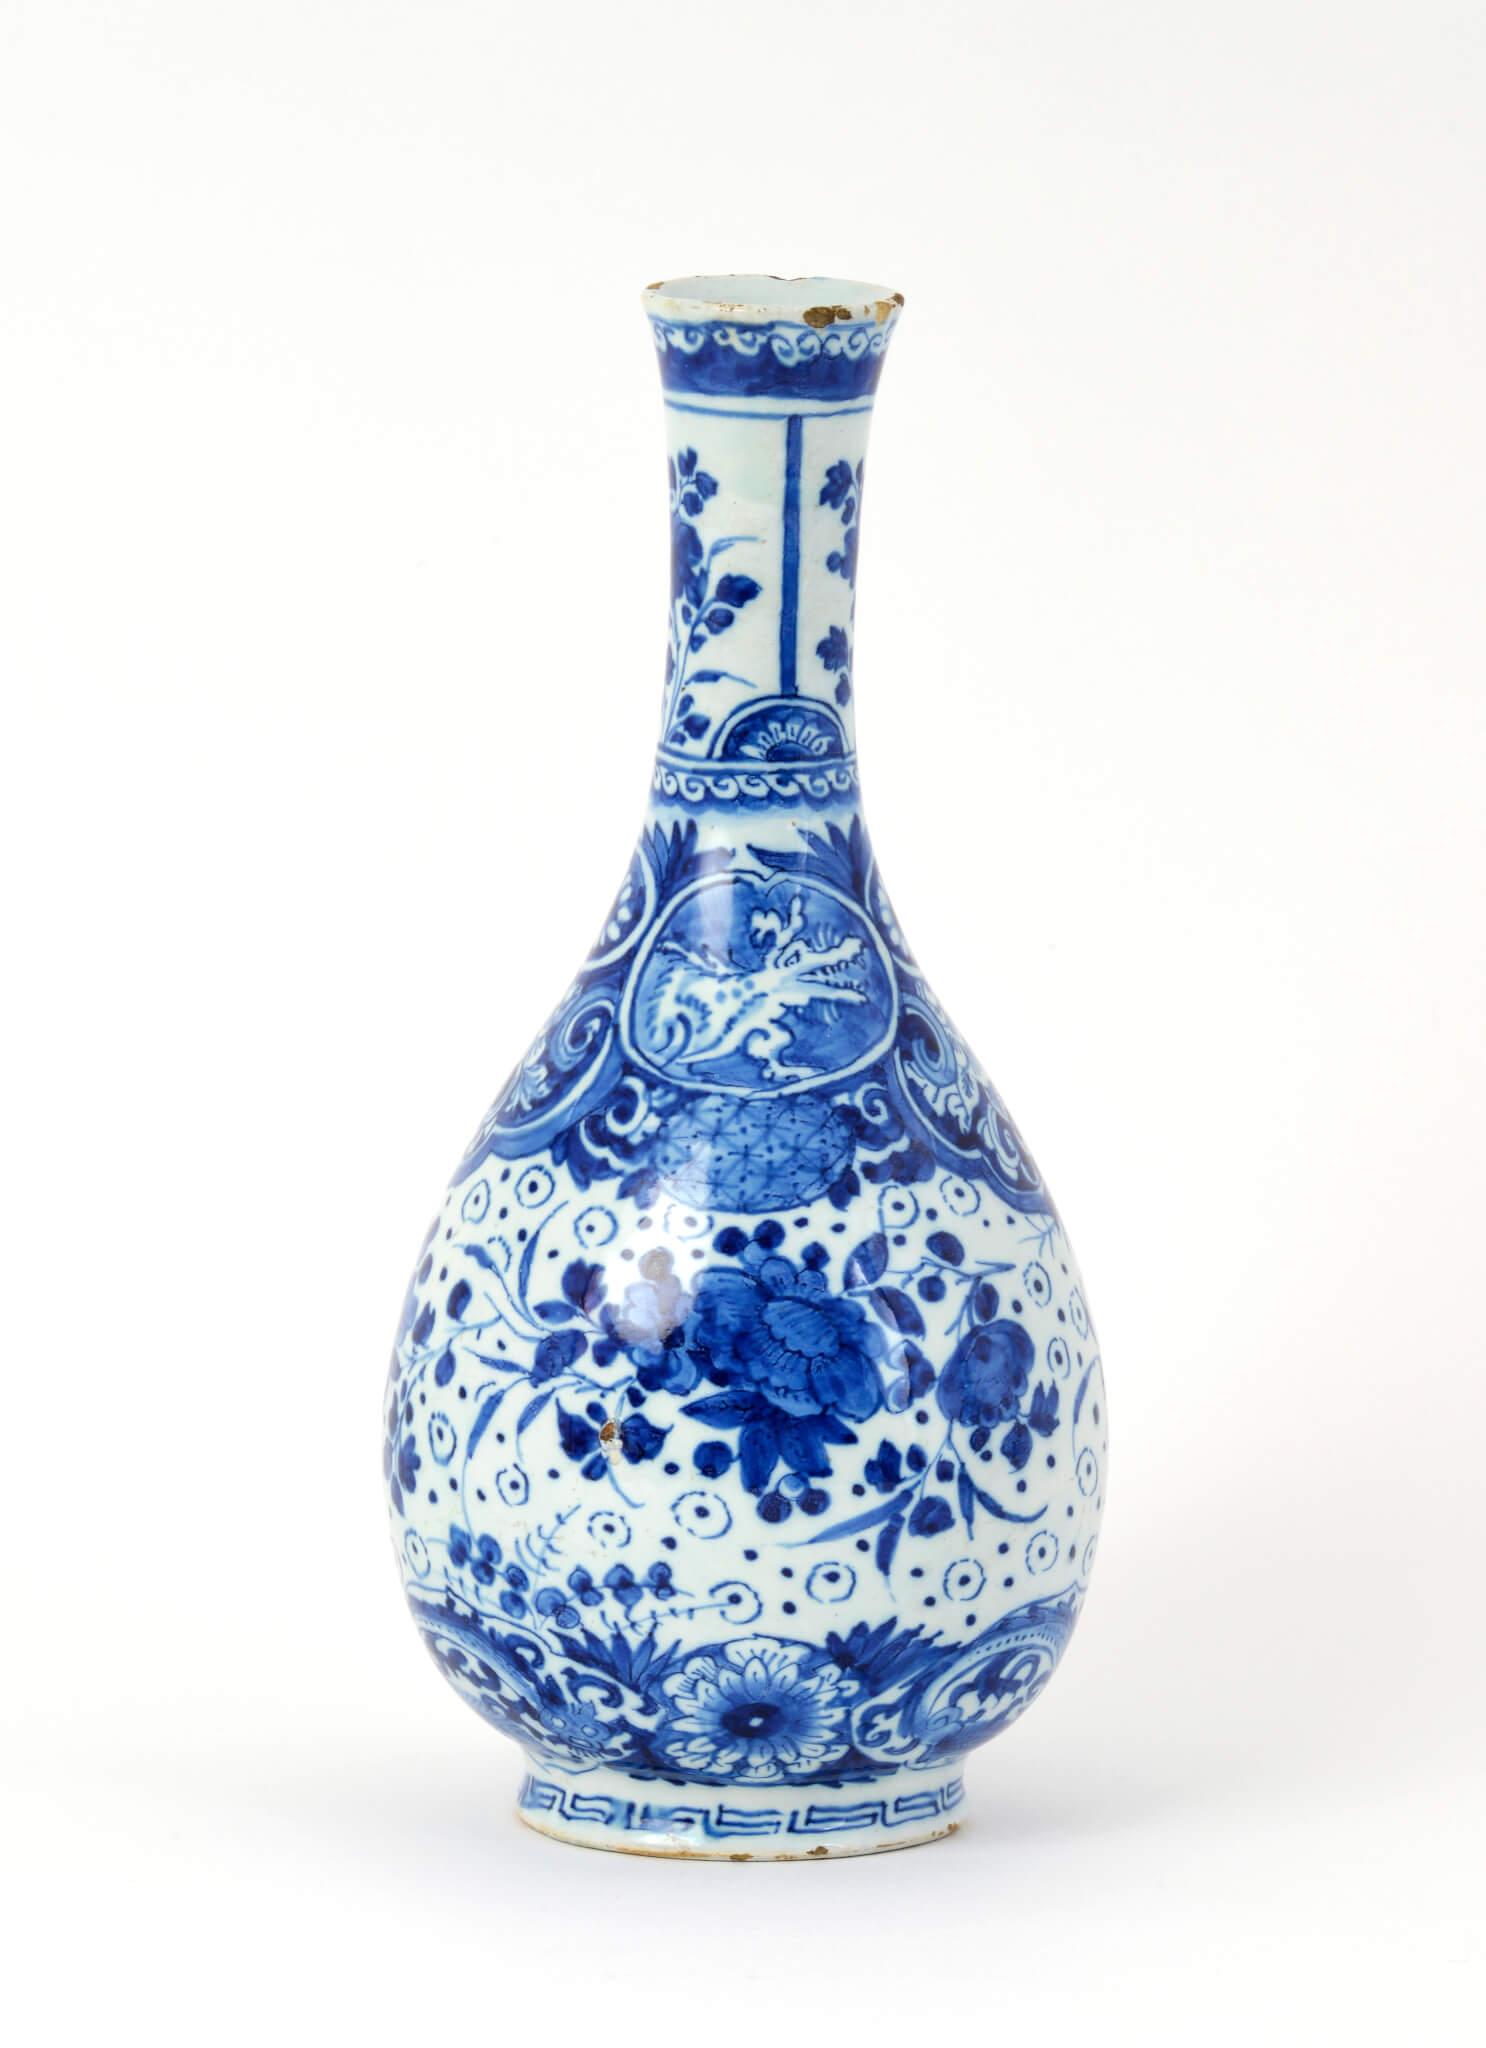 Blue And White Bottle Vase Antique Aronson Delftware